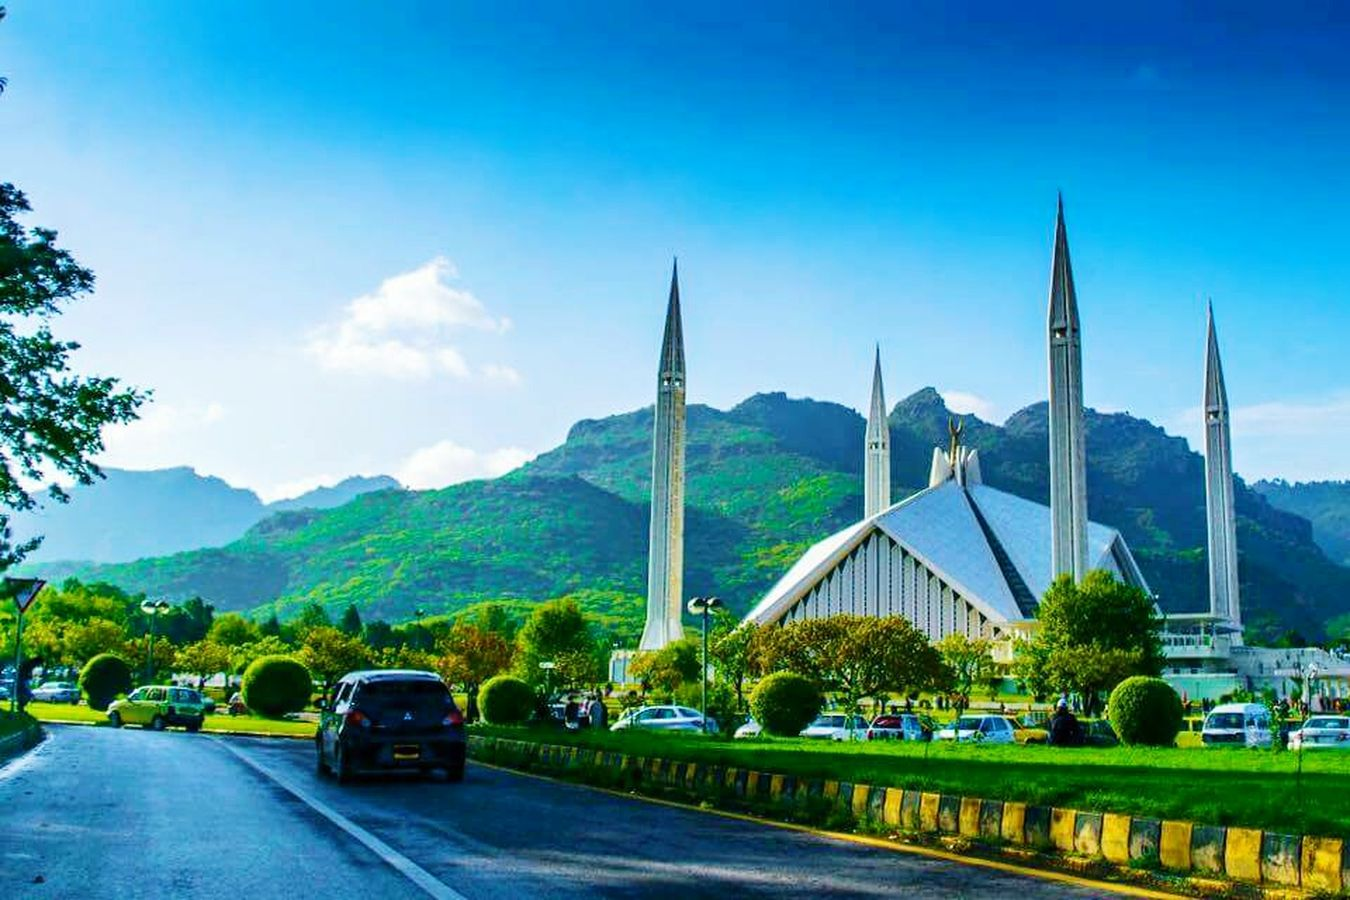 Mosque Masjid FaisalMosque Like4like Islamabad IslamabadTheBeautiful Mountains Likealways Landscape FaisalMasjid Faisal Masjid